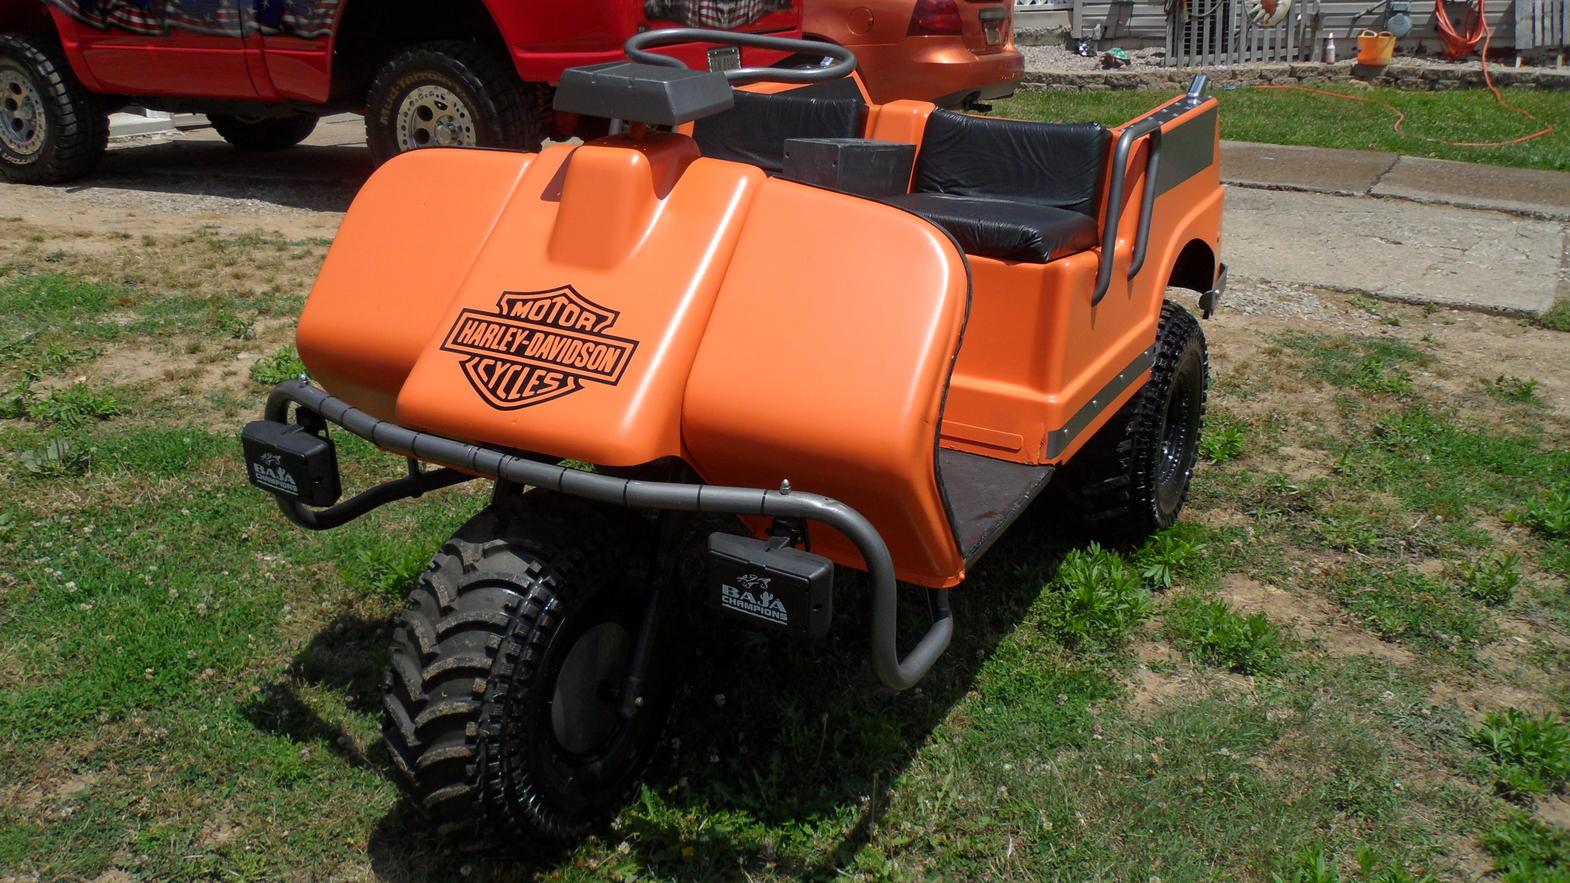 Harley Davidson 3 wheel golf cart on